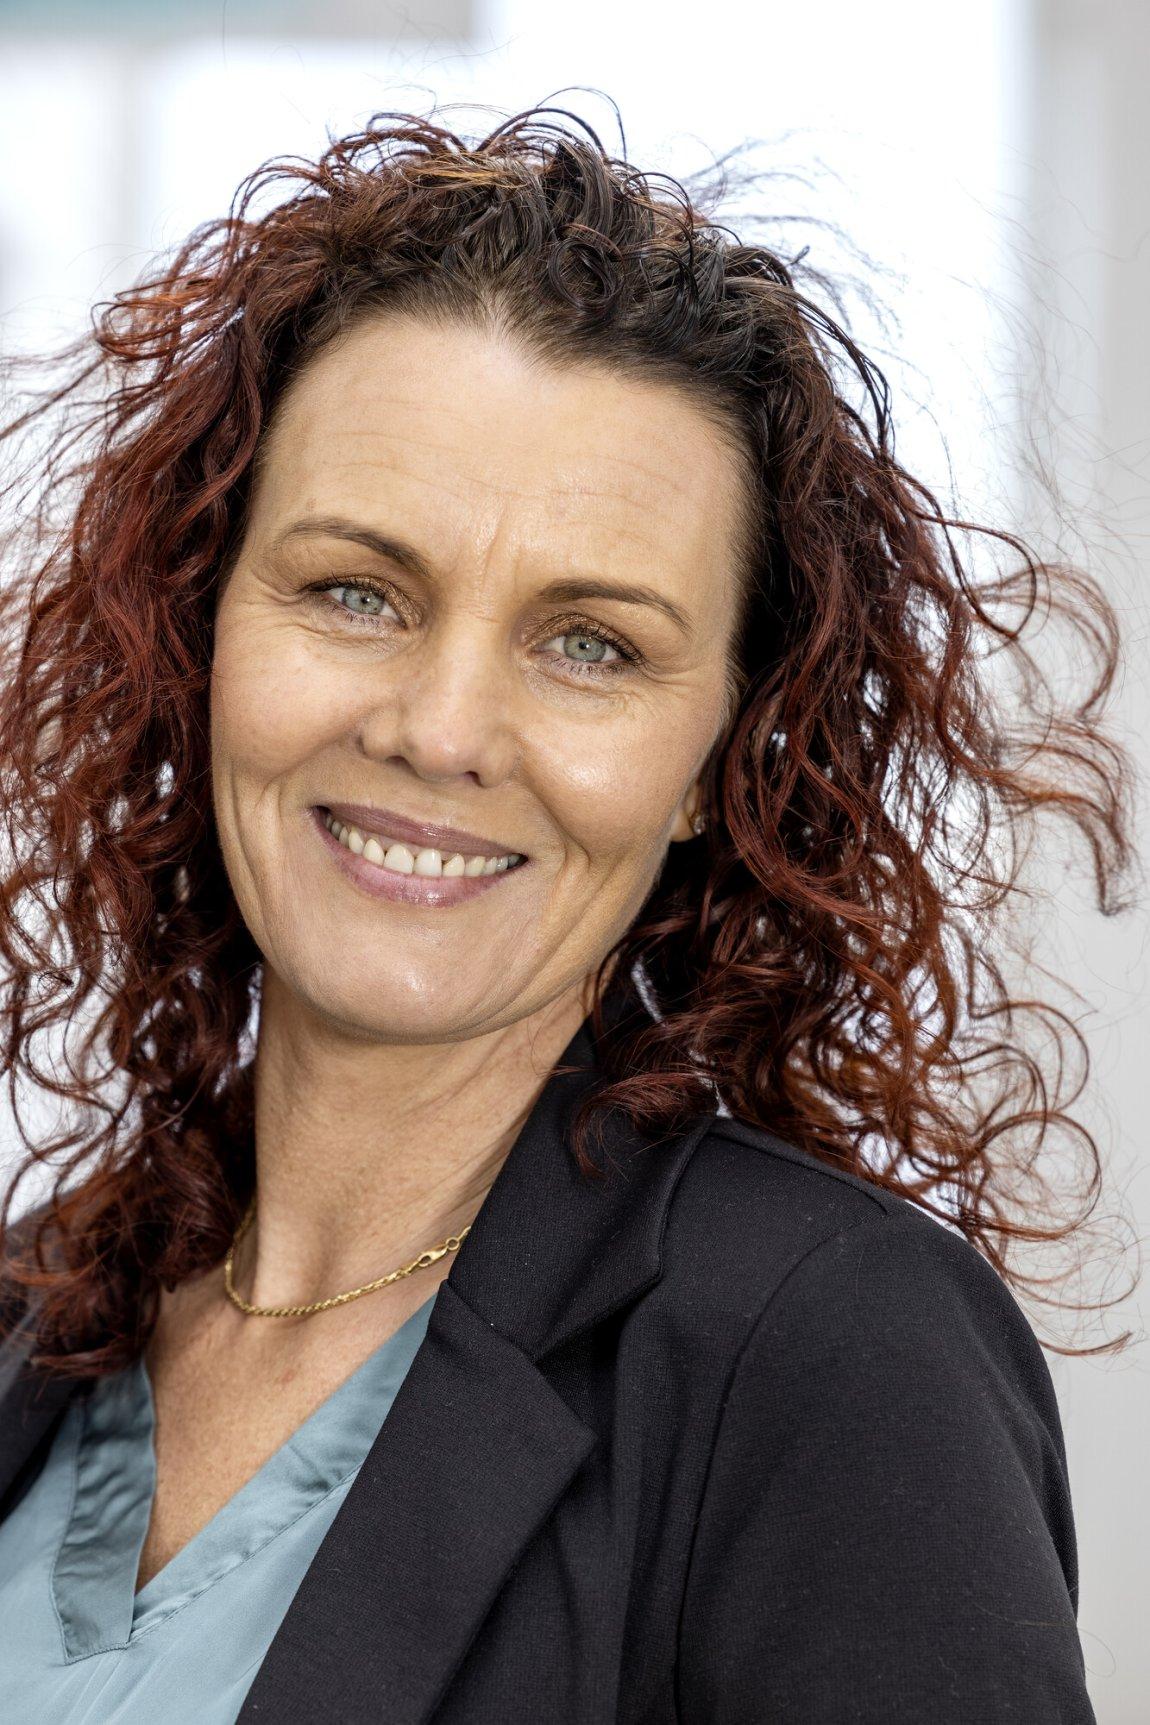 2021 Gro-Anita Mykjåland, Agder